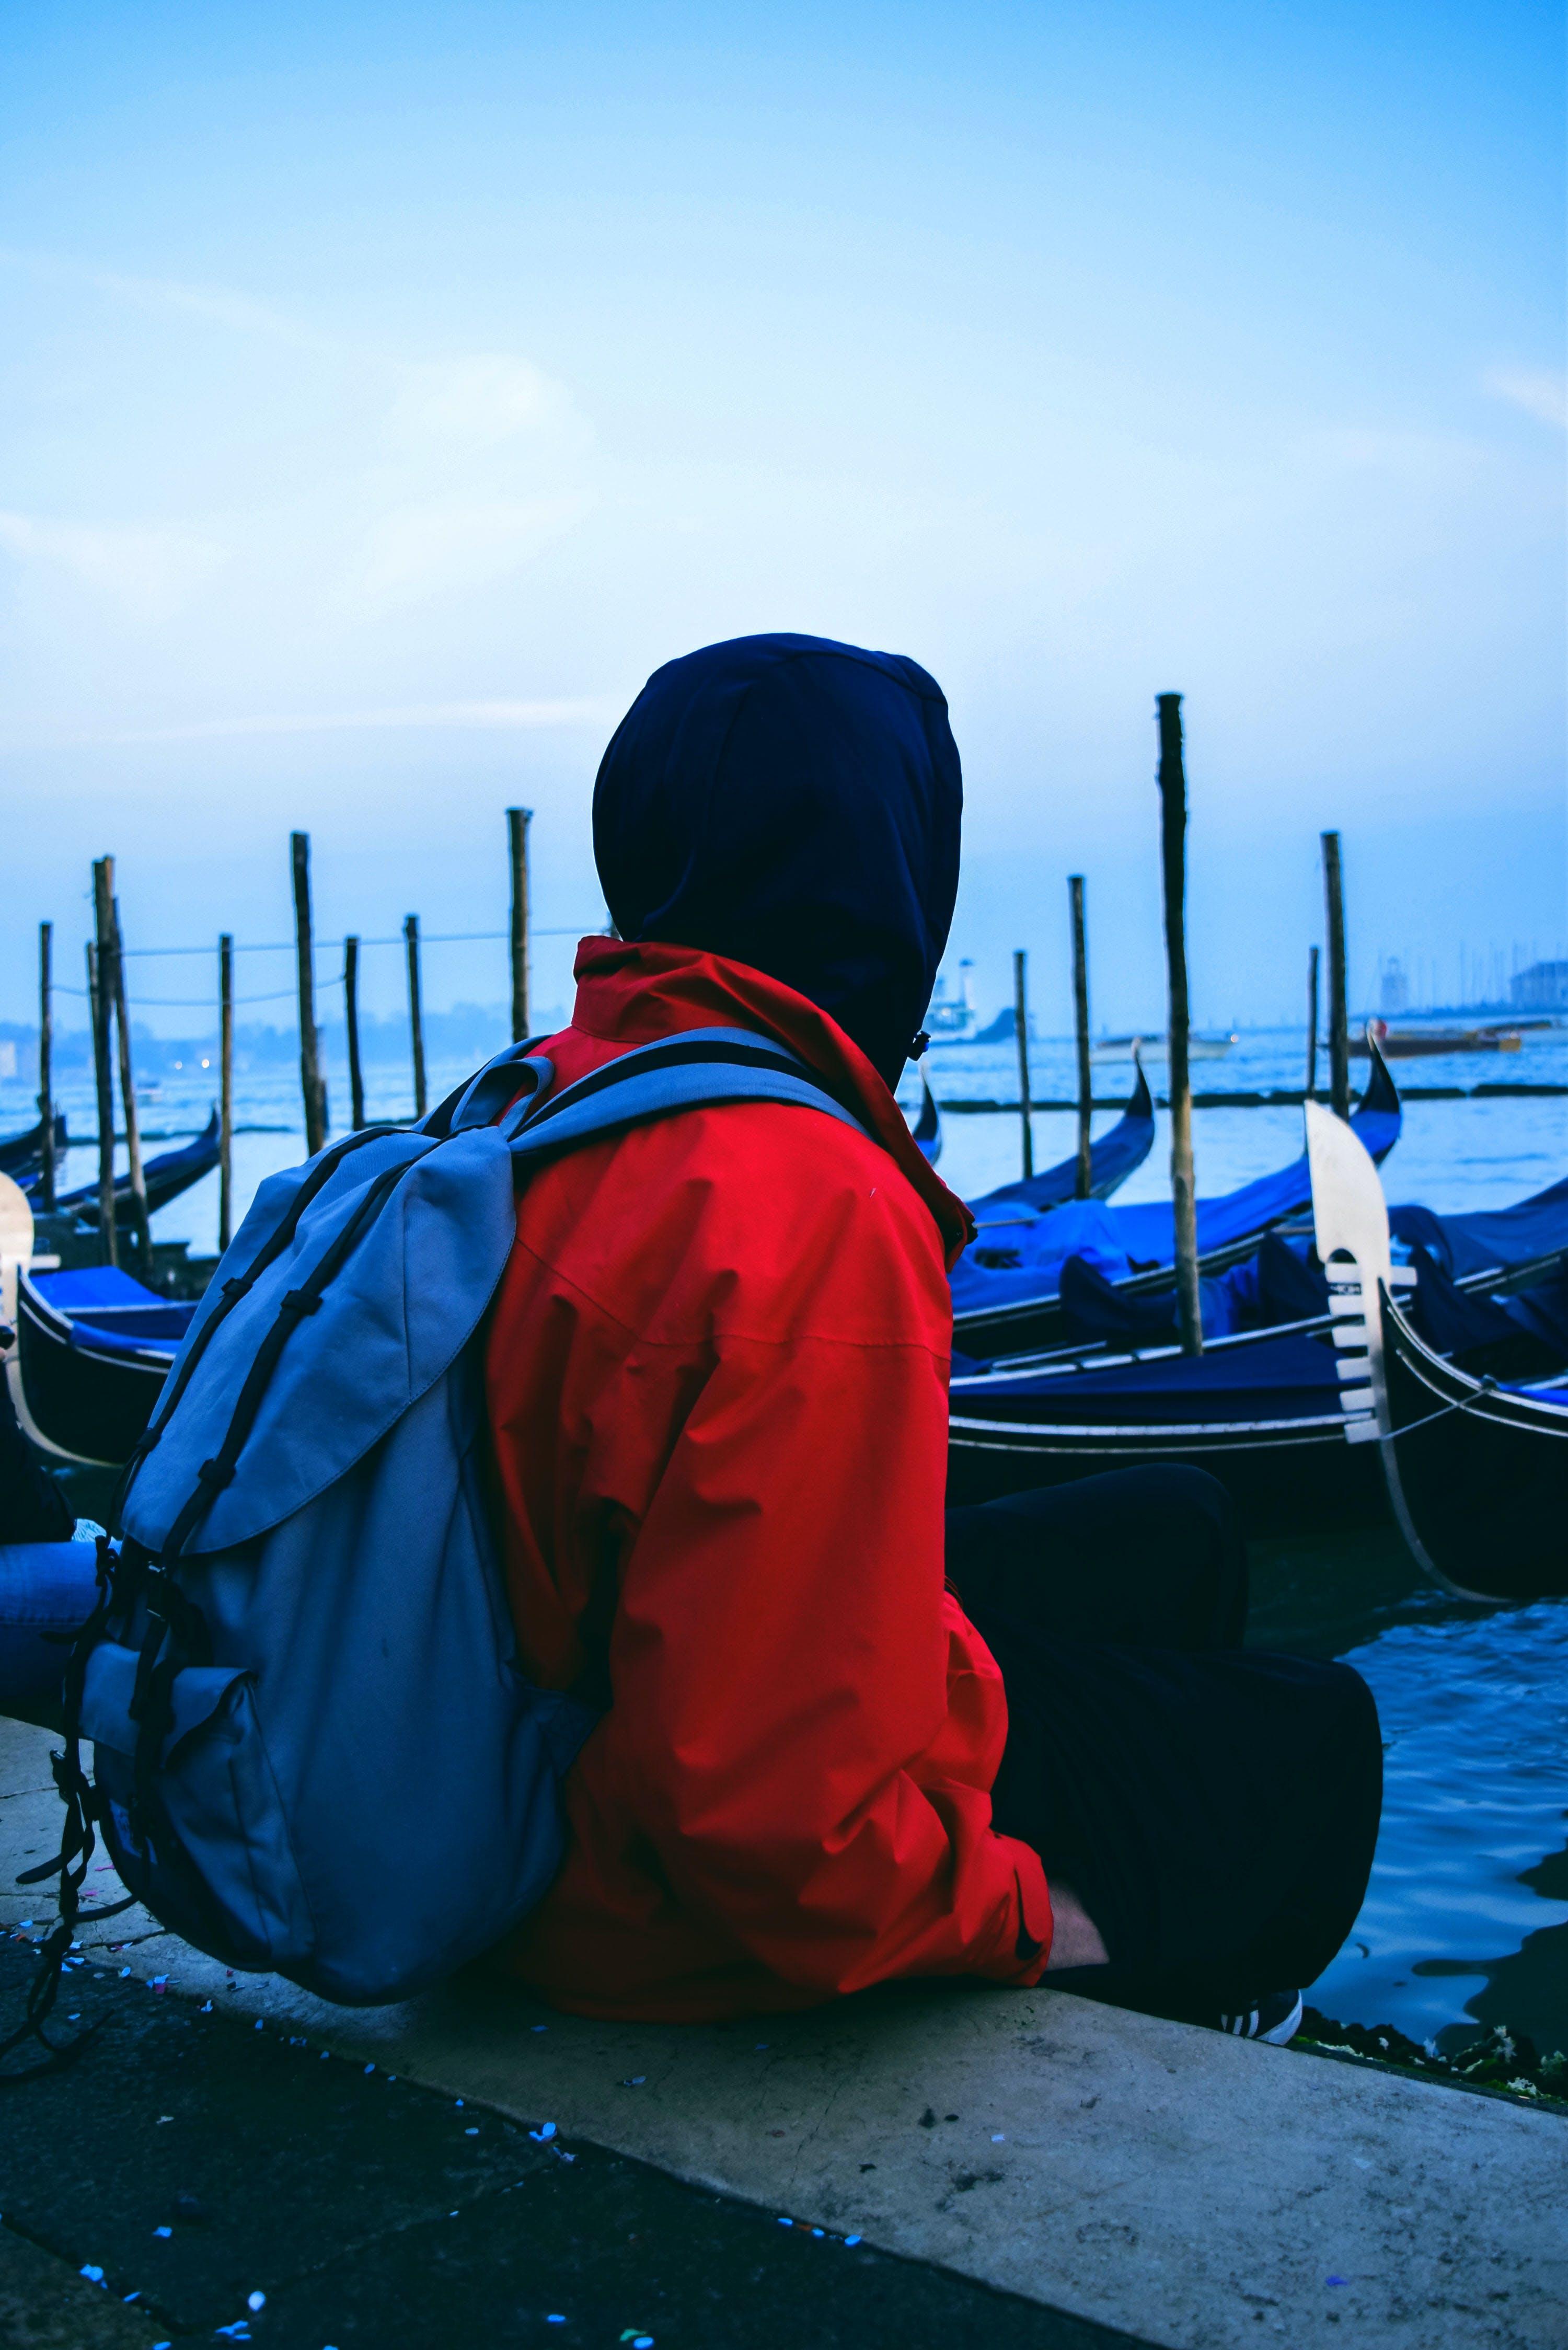 Free stock photo of adventure, alone, bag, blue